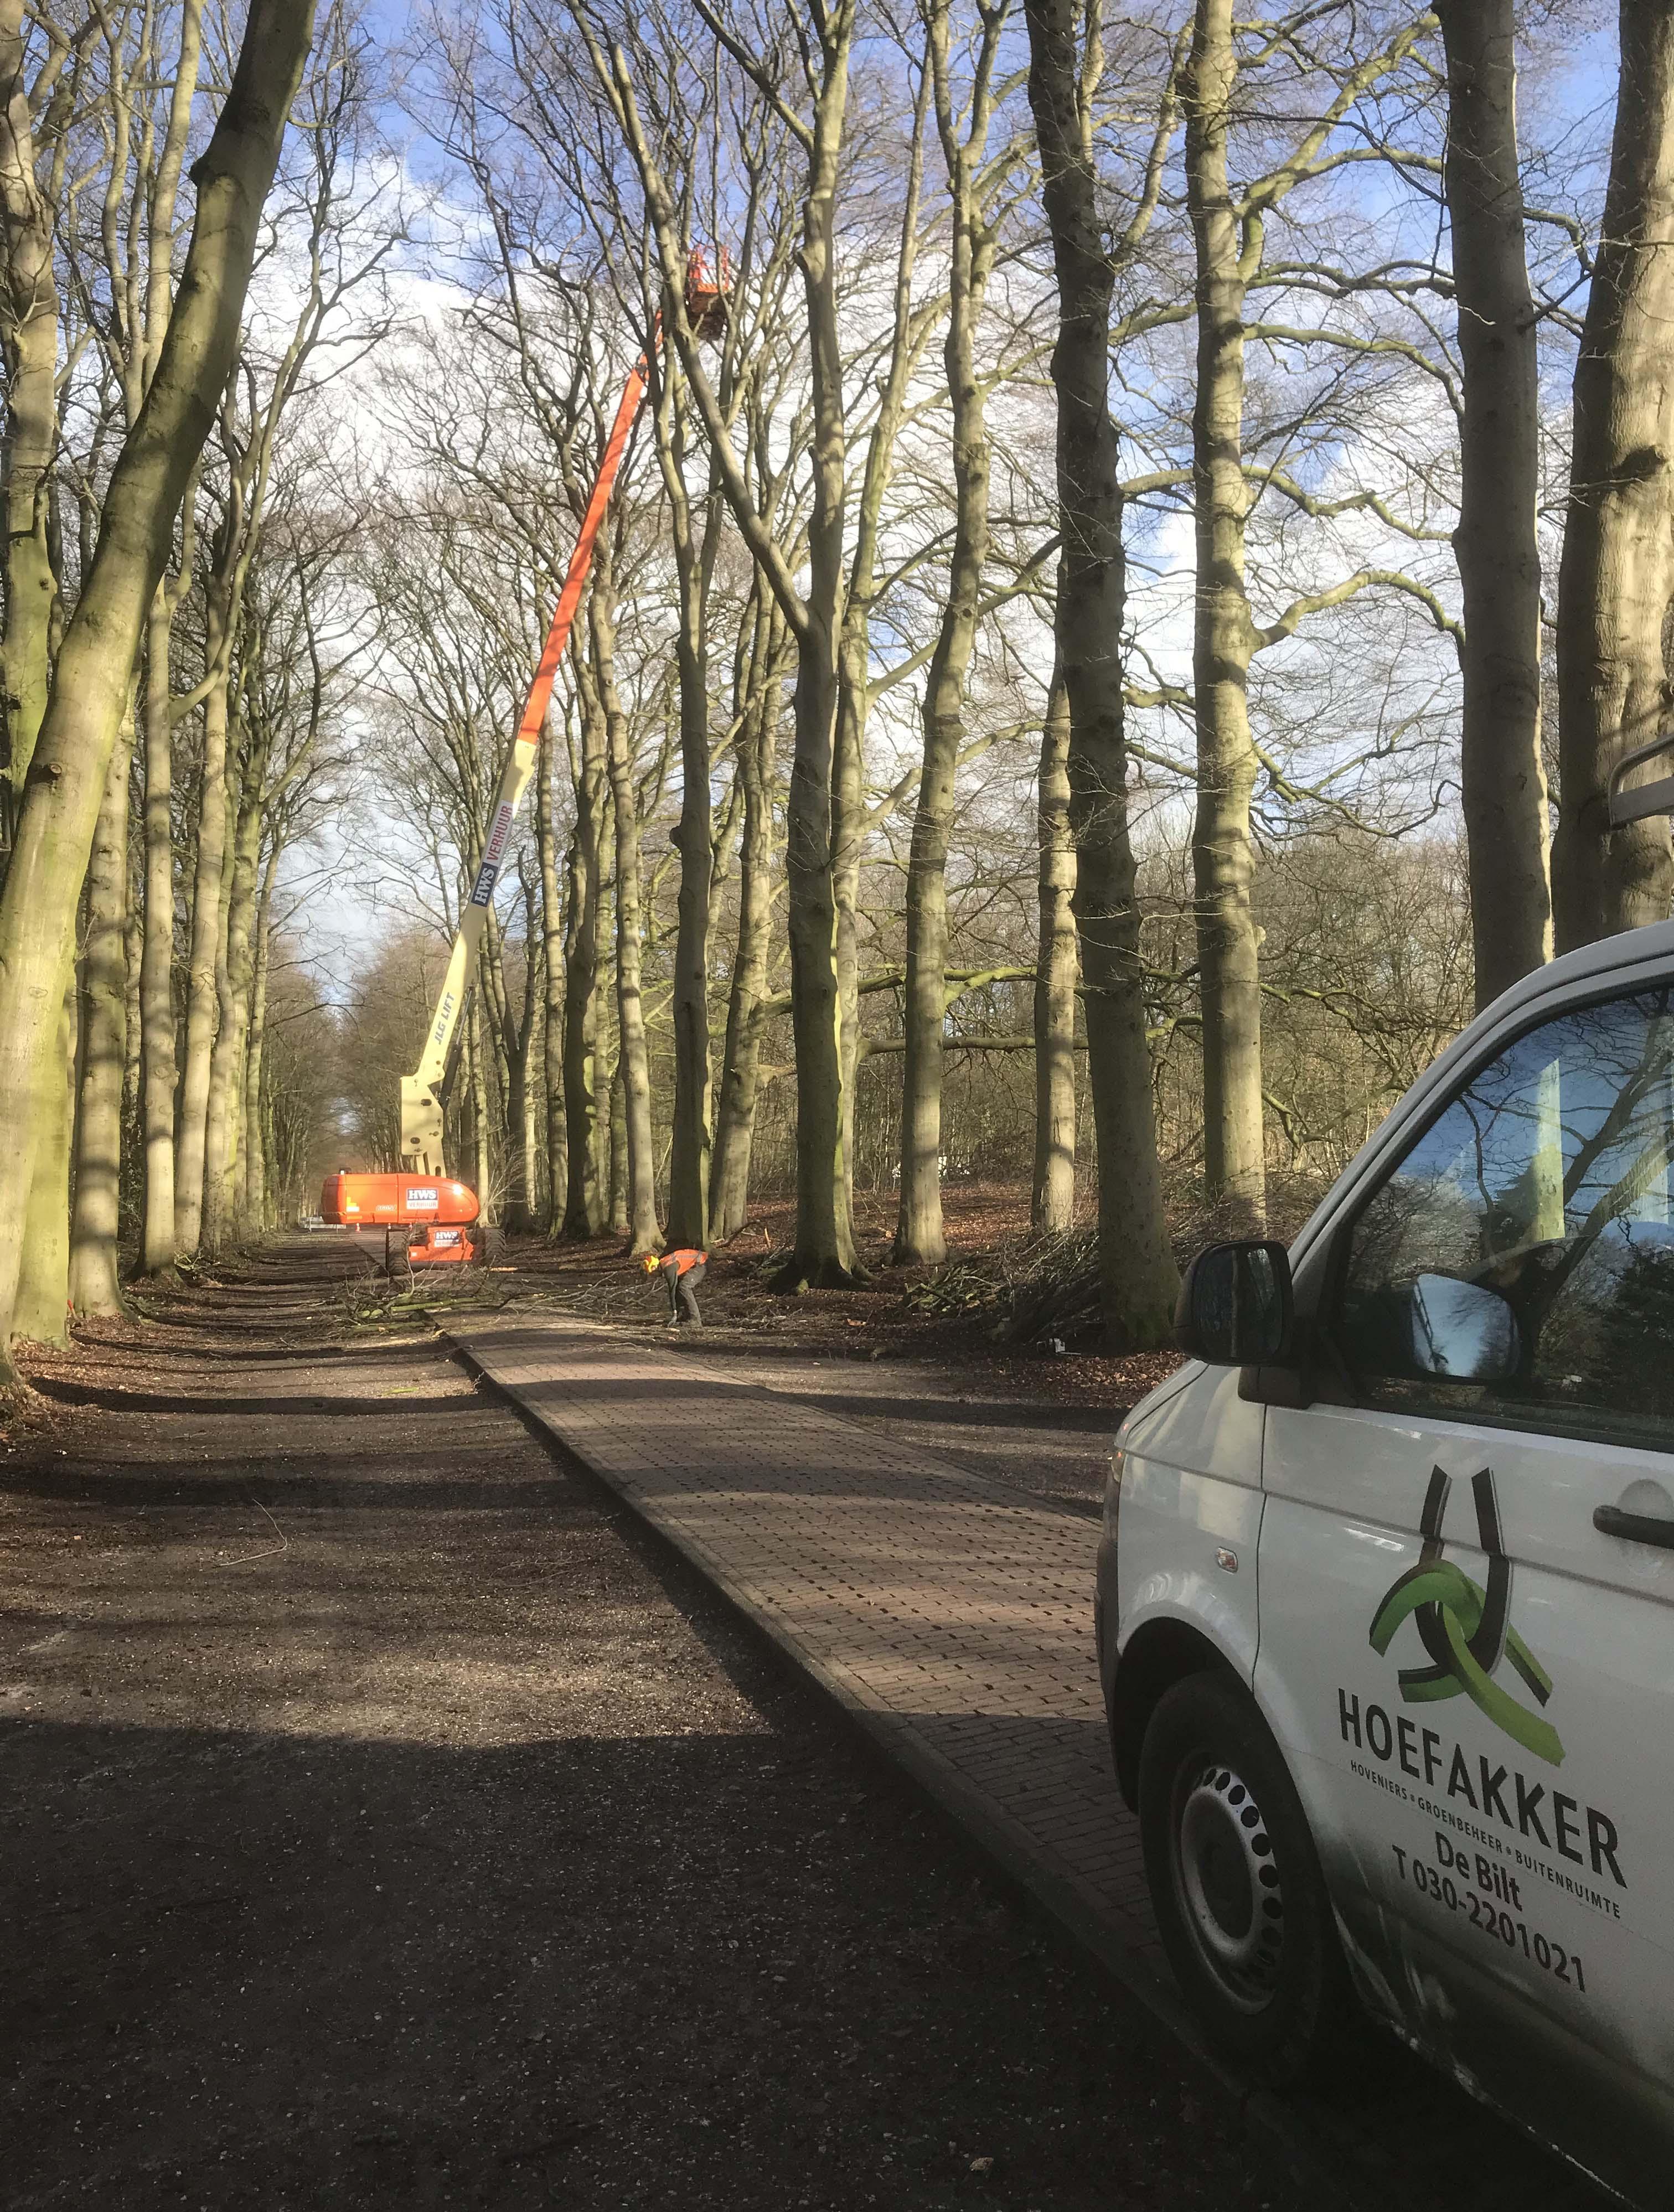 Hoefakker boomspecialisten snoeien monumentale beuken Geldersch Landschap (8m)